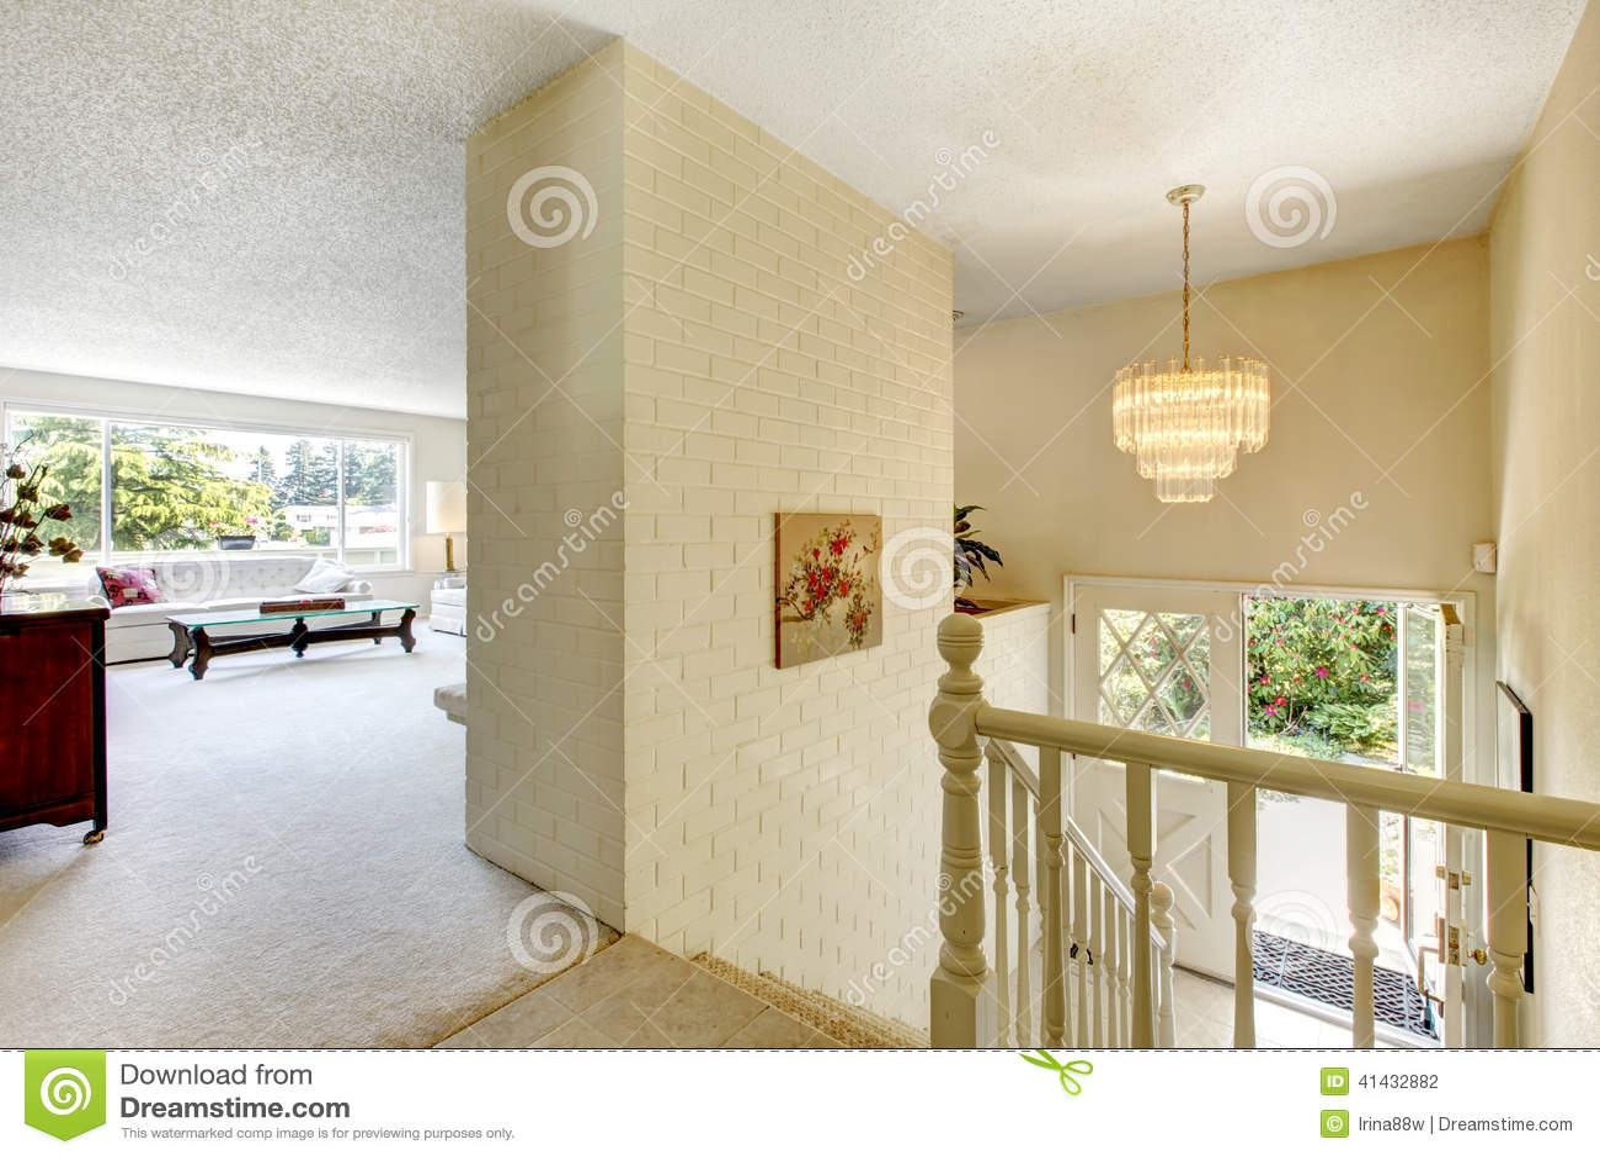 Brick Entrance Hall House Interior Living